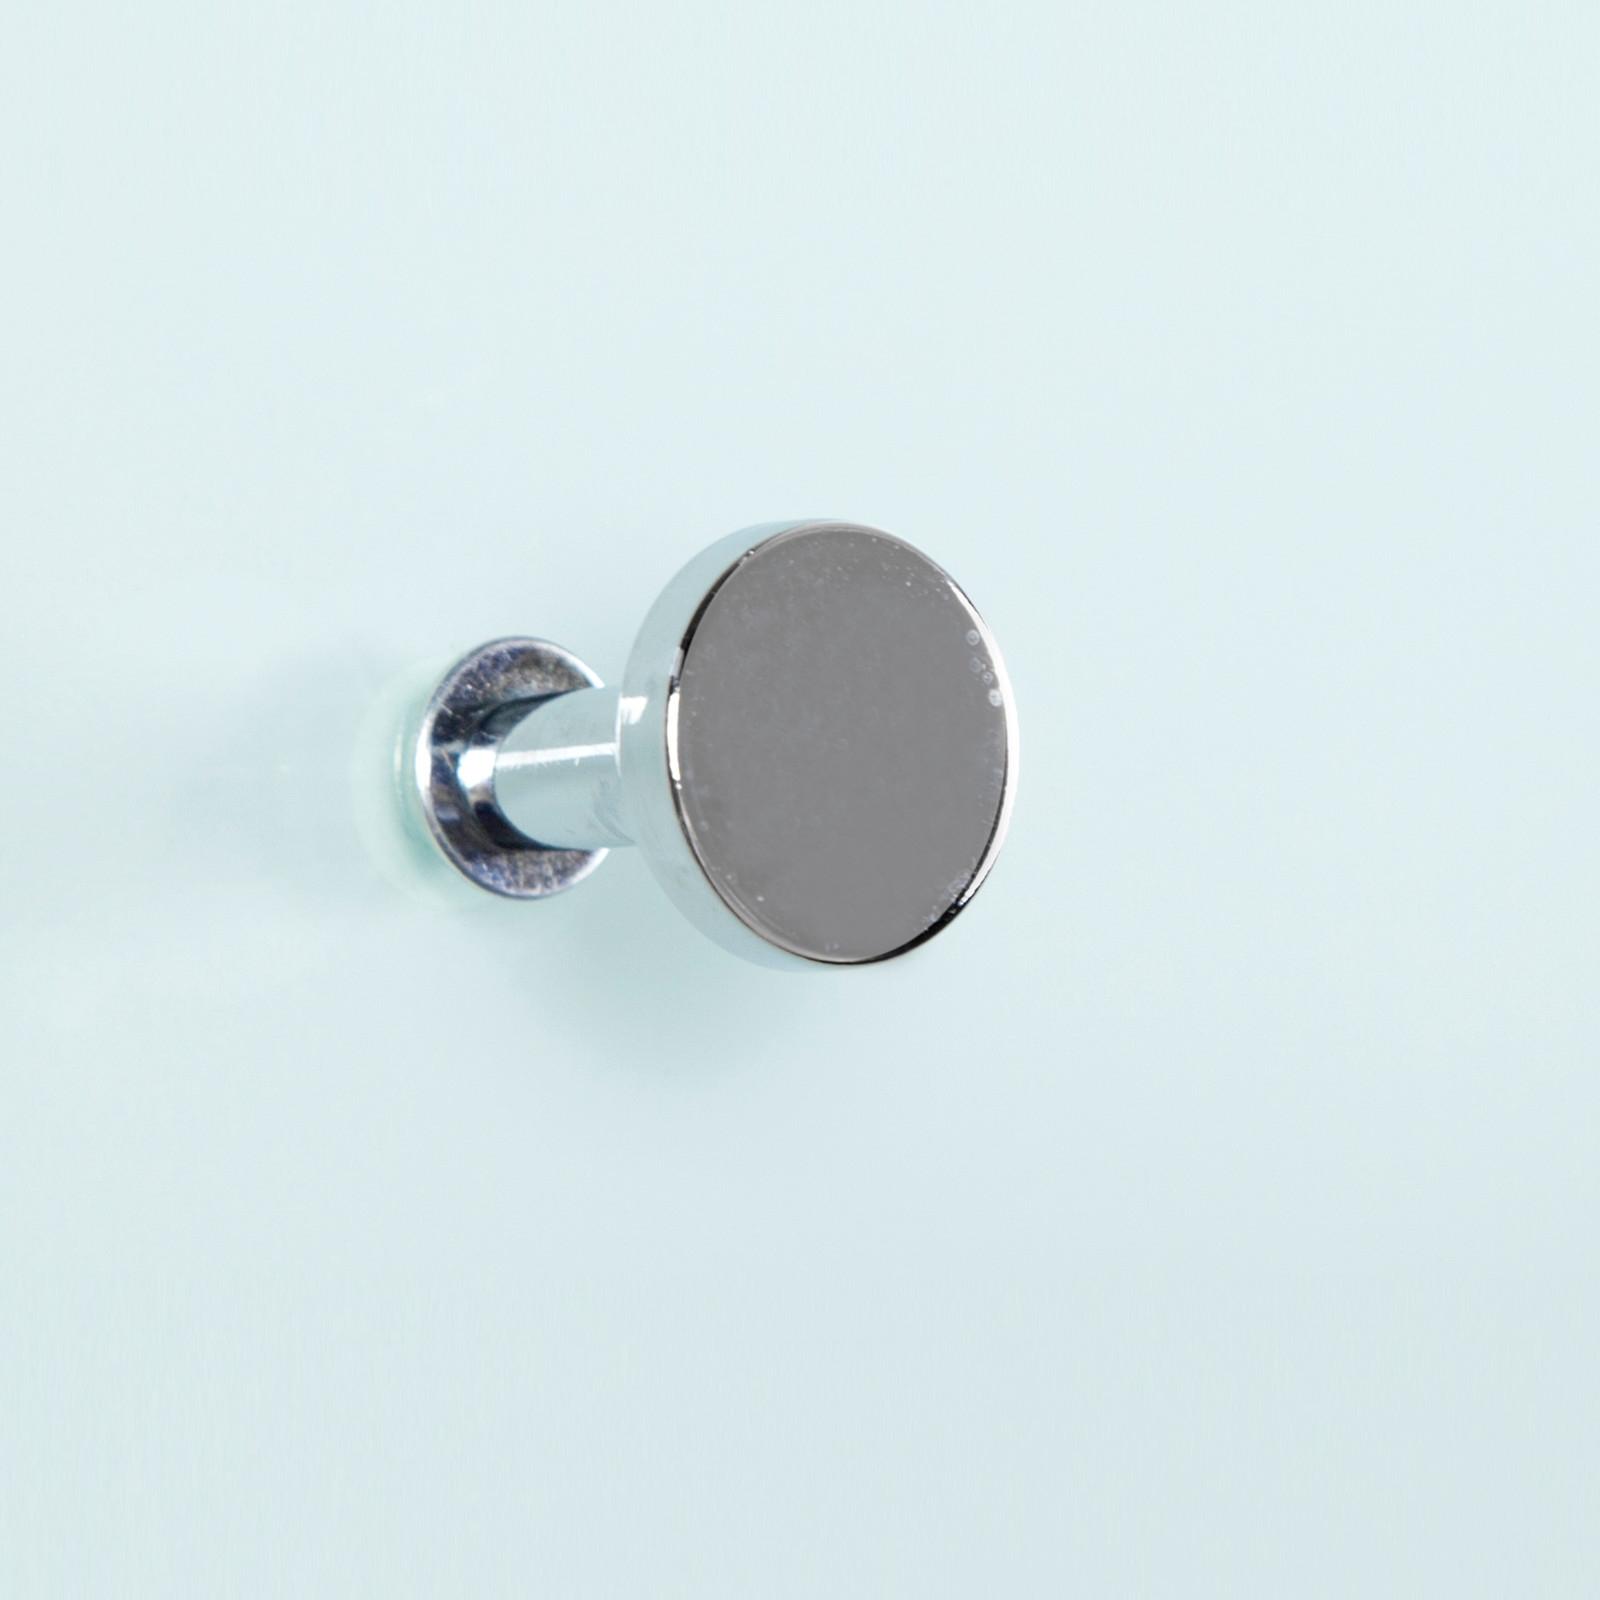 edle design wandgardeobe azzaretti glas chrom wandhaken garderobe modern ebay. Black Bedroom Furniture Sets. Home Design Ideas